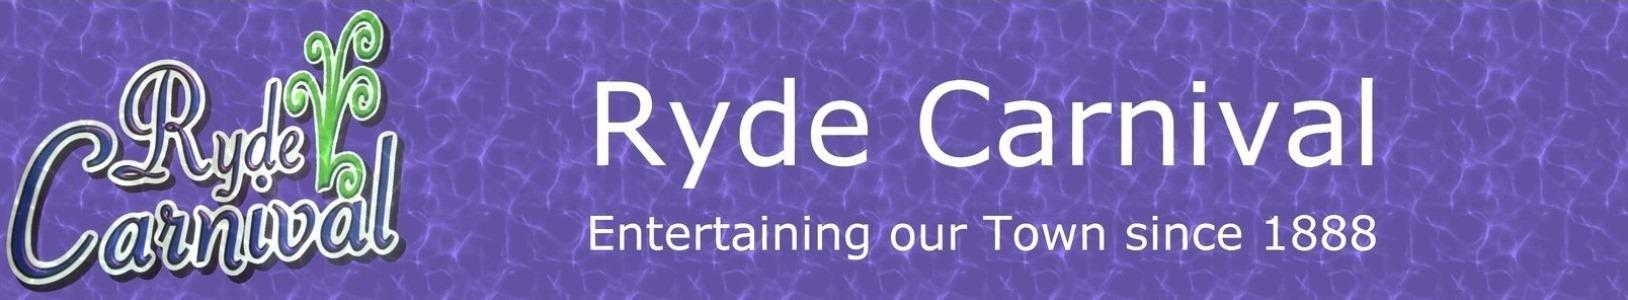 Ryde Carnival Association